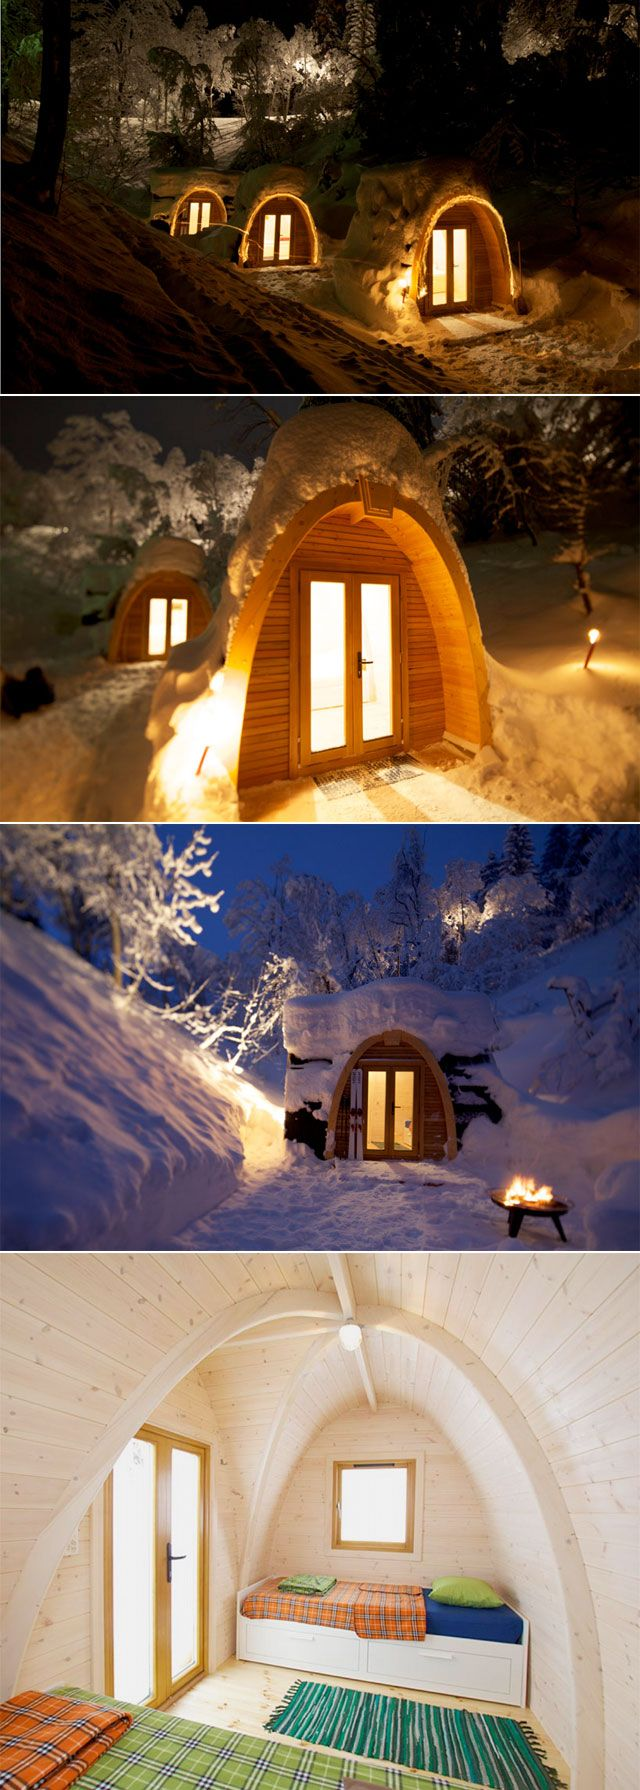 FIRST ECO POD HOTEL IN SWITZERLAND